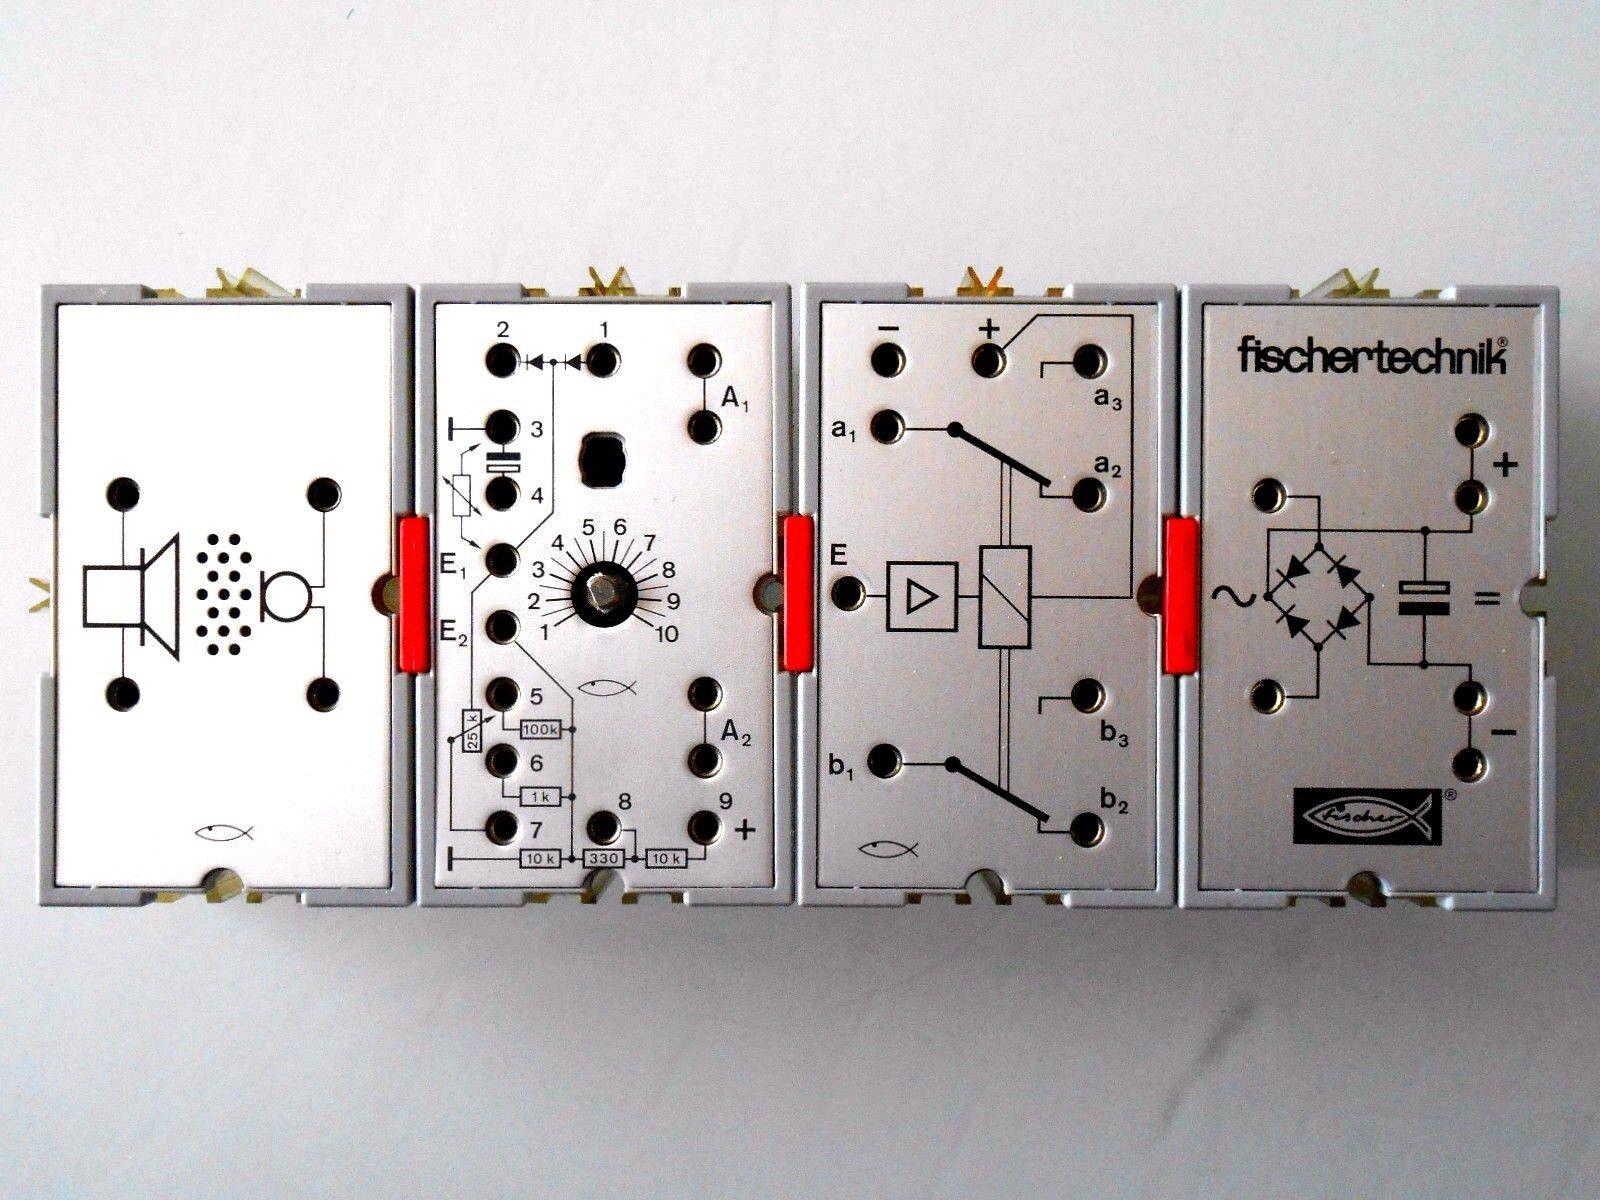 Fischertechnik argentolinge di Hobby4 u-t4 Elettronica Mattoncini   Top